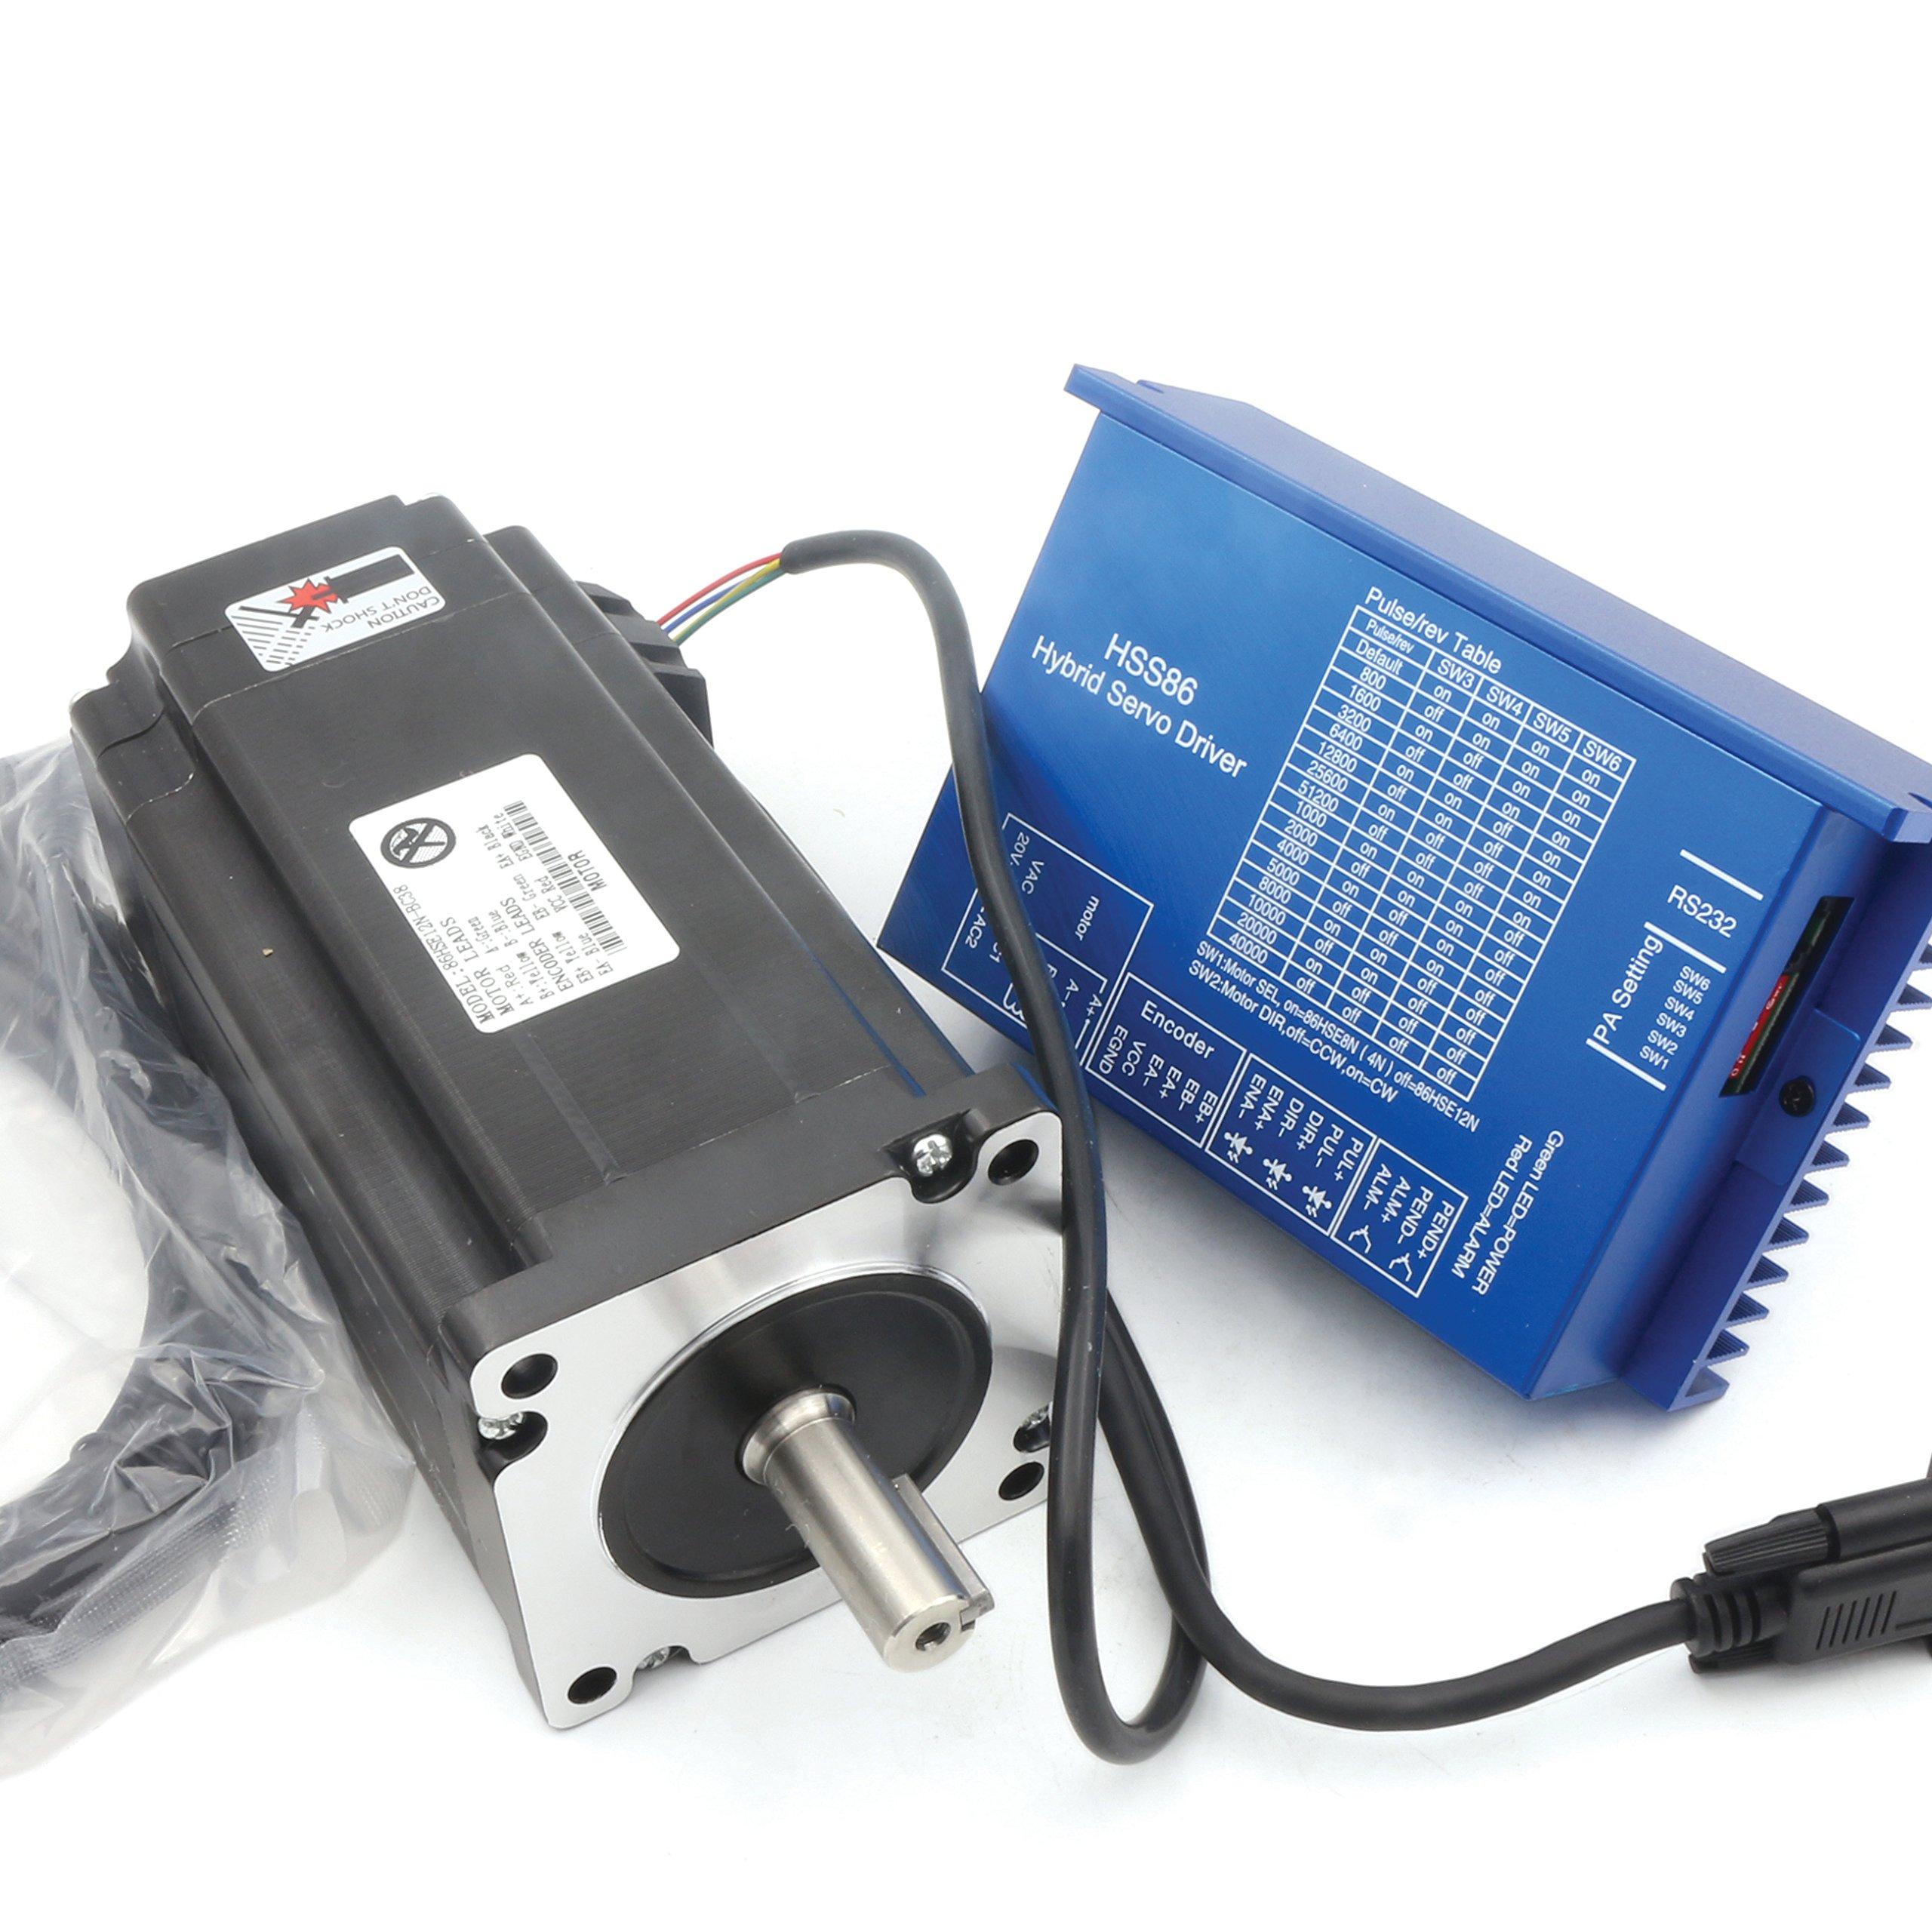 Buy Cnc 2hss86h Hybrid Closed Loop Stepper Servo Drive Driver 45nm Power Supply For Motor A May Nema34 12nm 154mm 6a 2 Phase